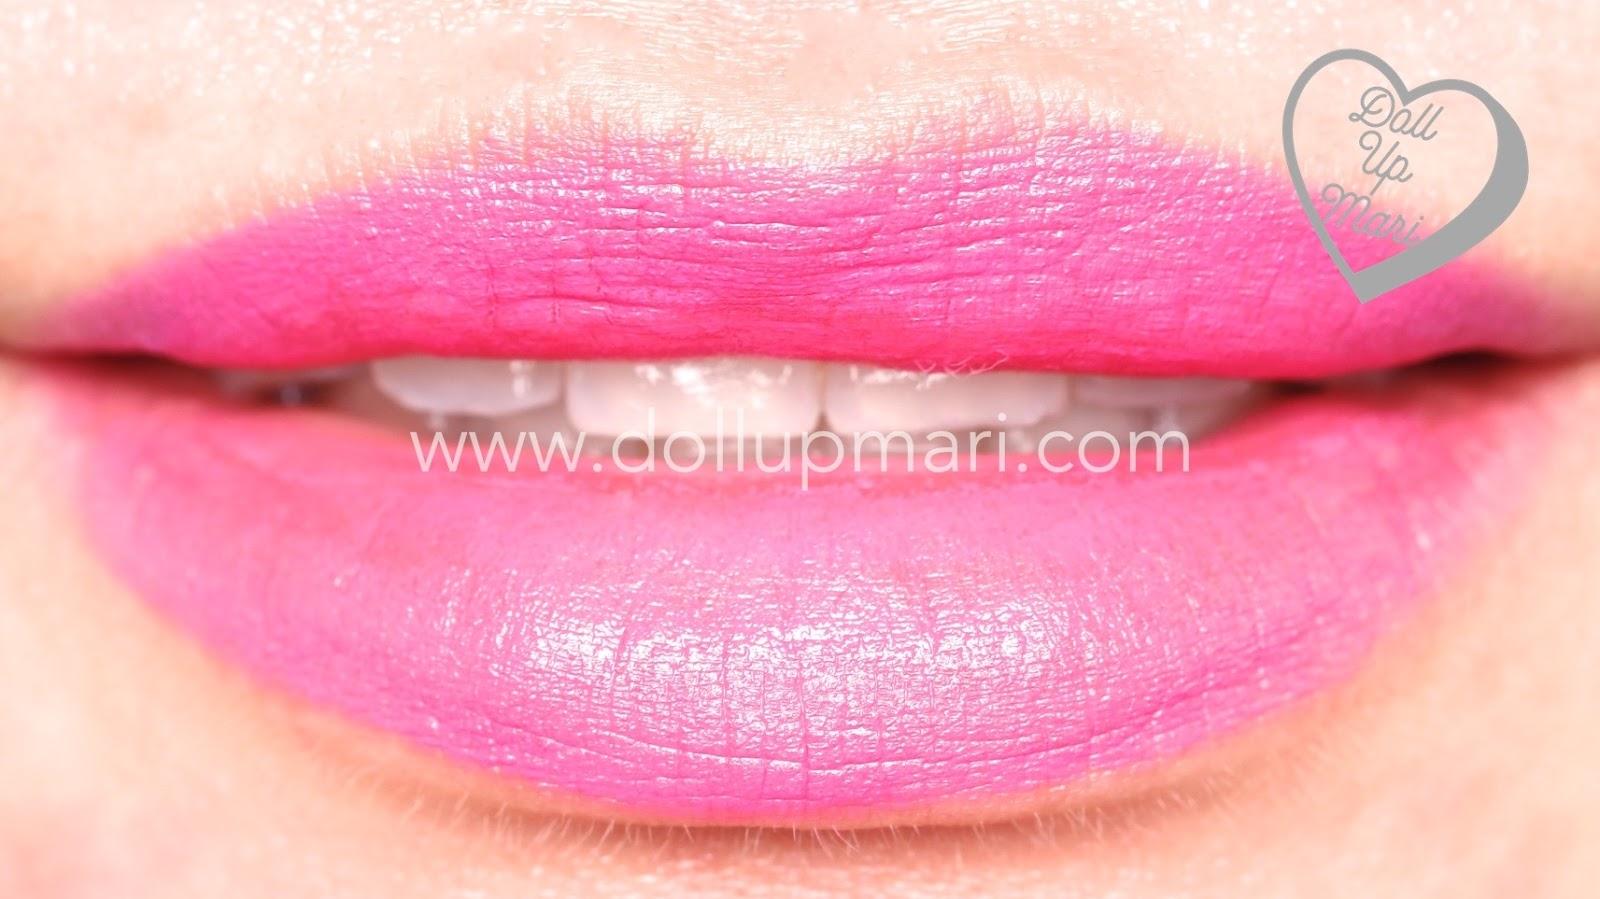 lip swatch of Splendidly Fuchsia shade of AVON Perfectly Matte Lipstick